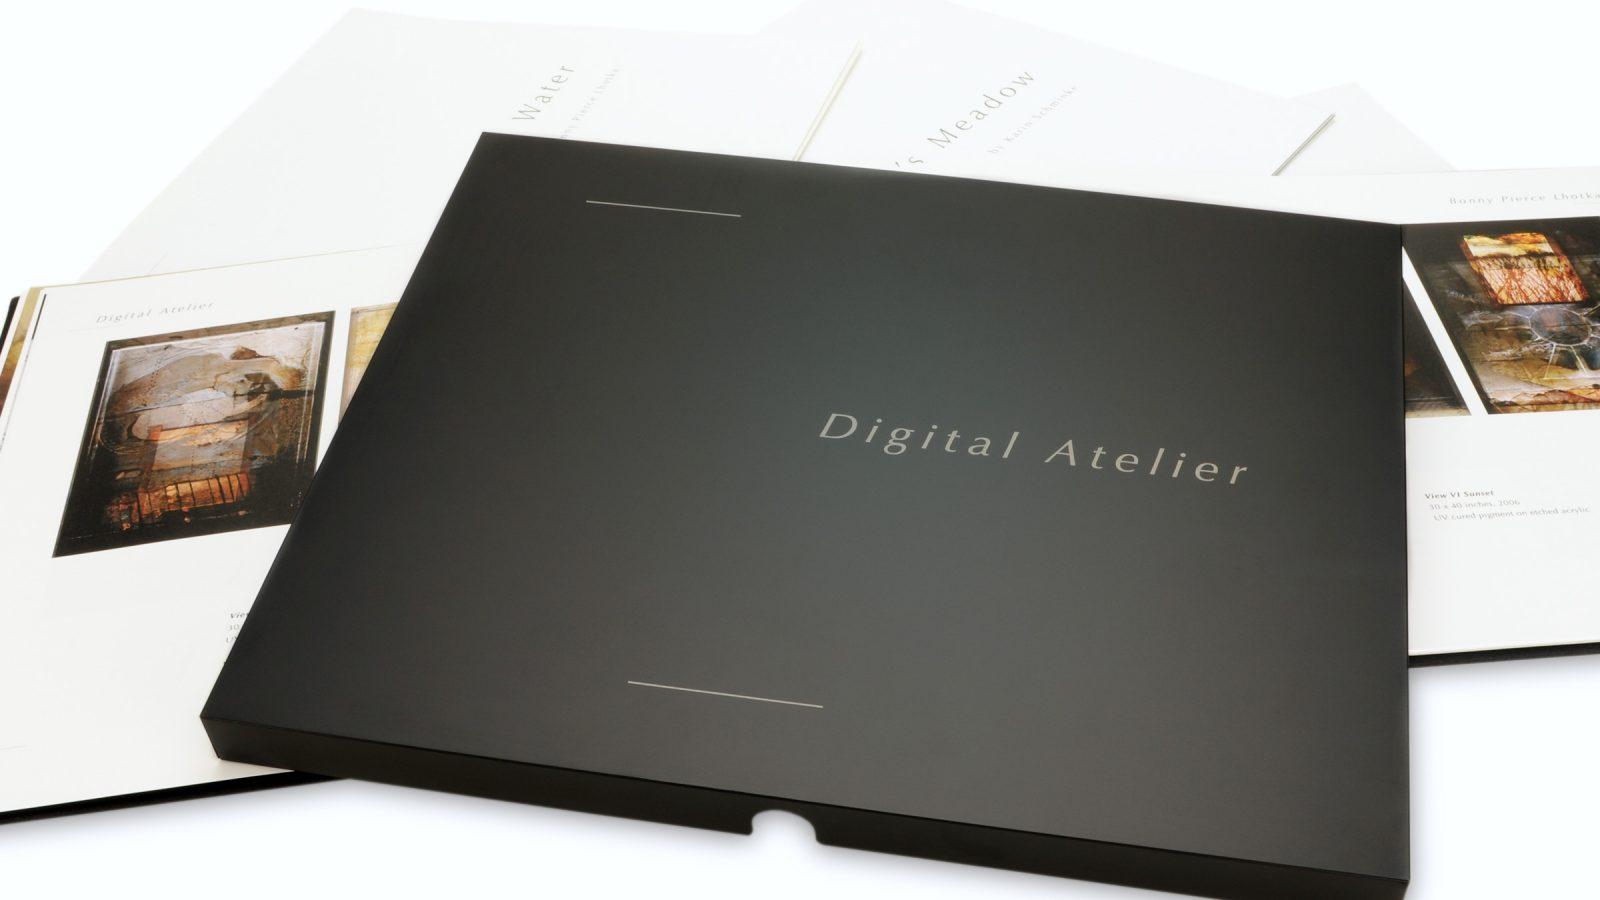 Digitalatelier